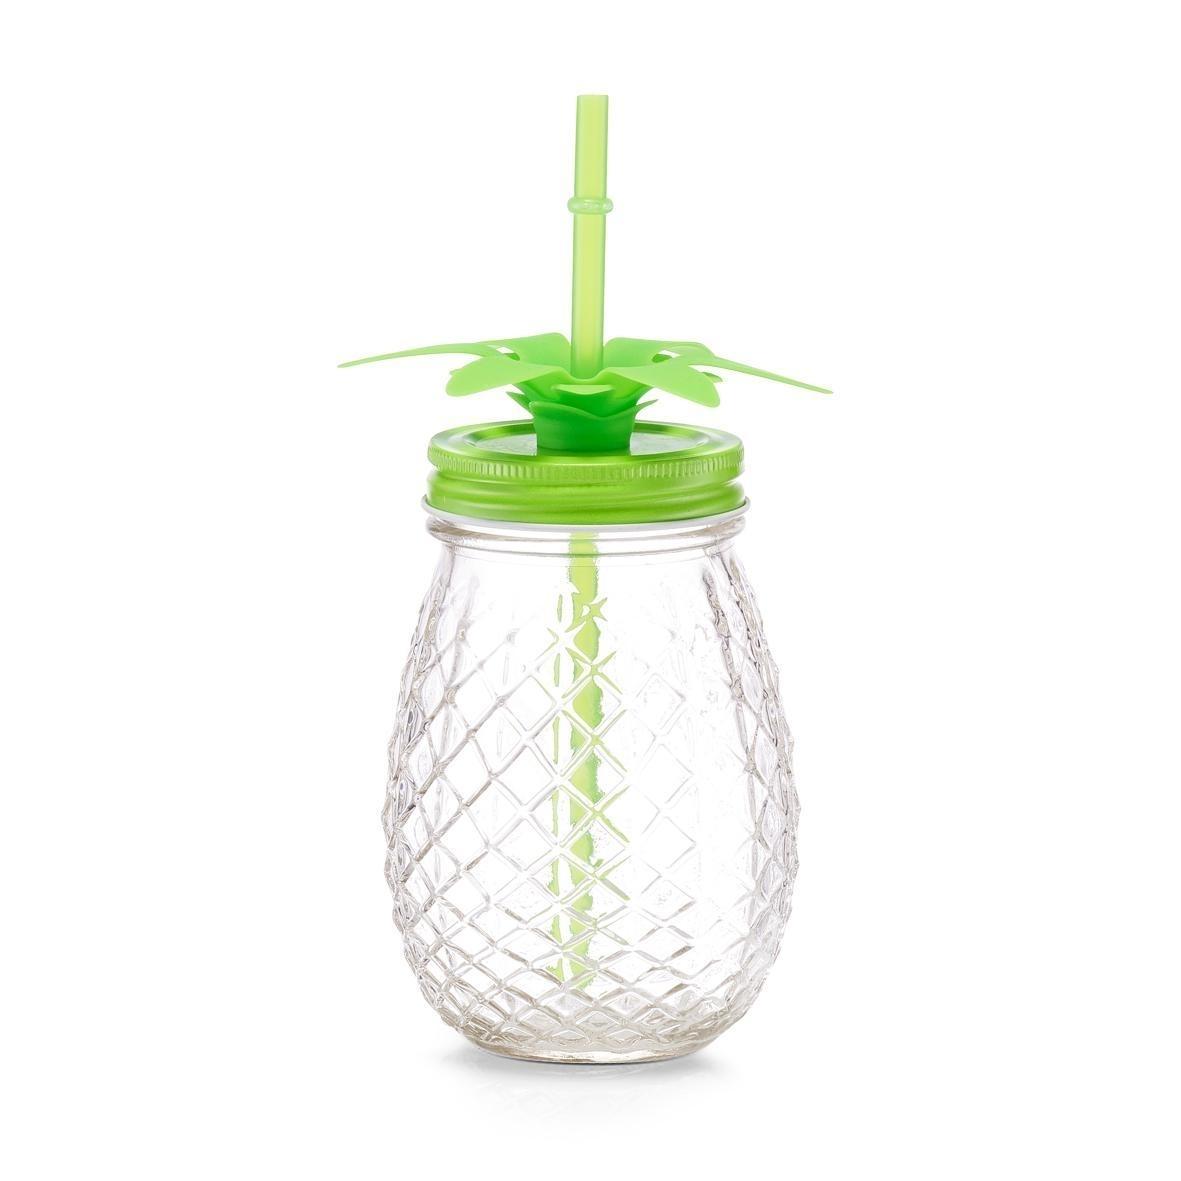 Pahar pentru limonada din sticla, capac si pai, Pineapple Verde, 500 ml, Ø9,5xH14,5 cm